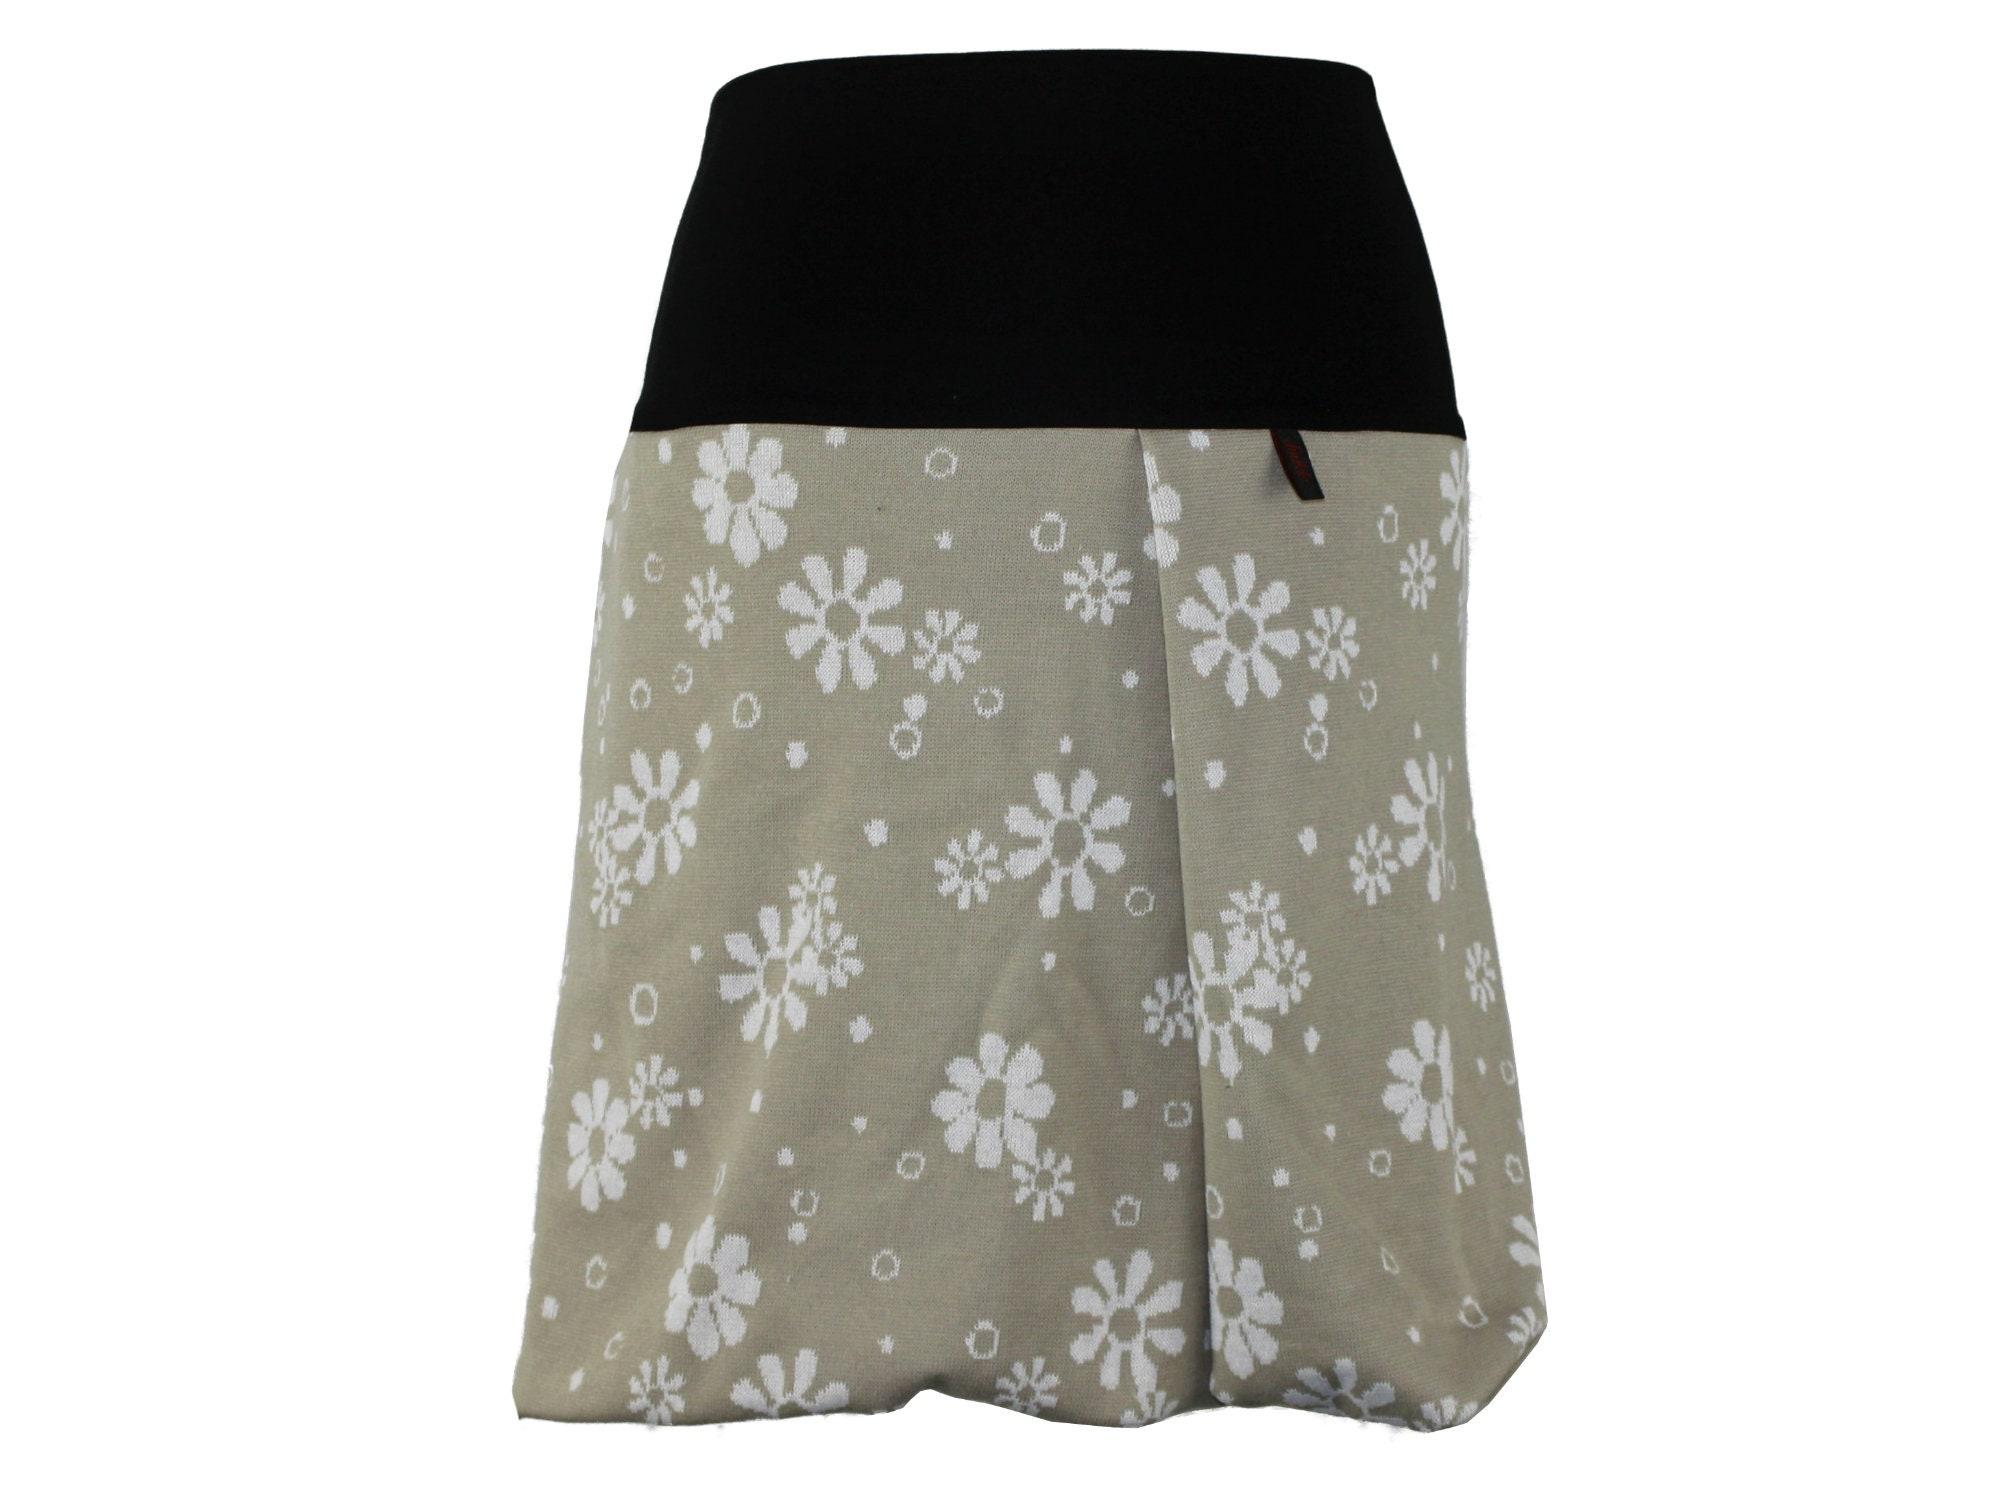 Skirt Bubble skirt knit beige beige beige blanco flower knit skirt midi MidiSkirt Woman Balloon c1f1d3